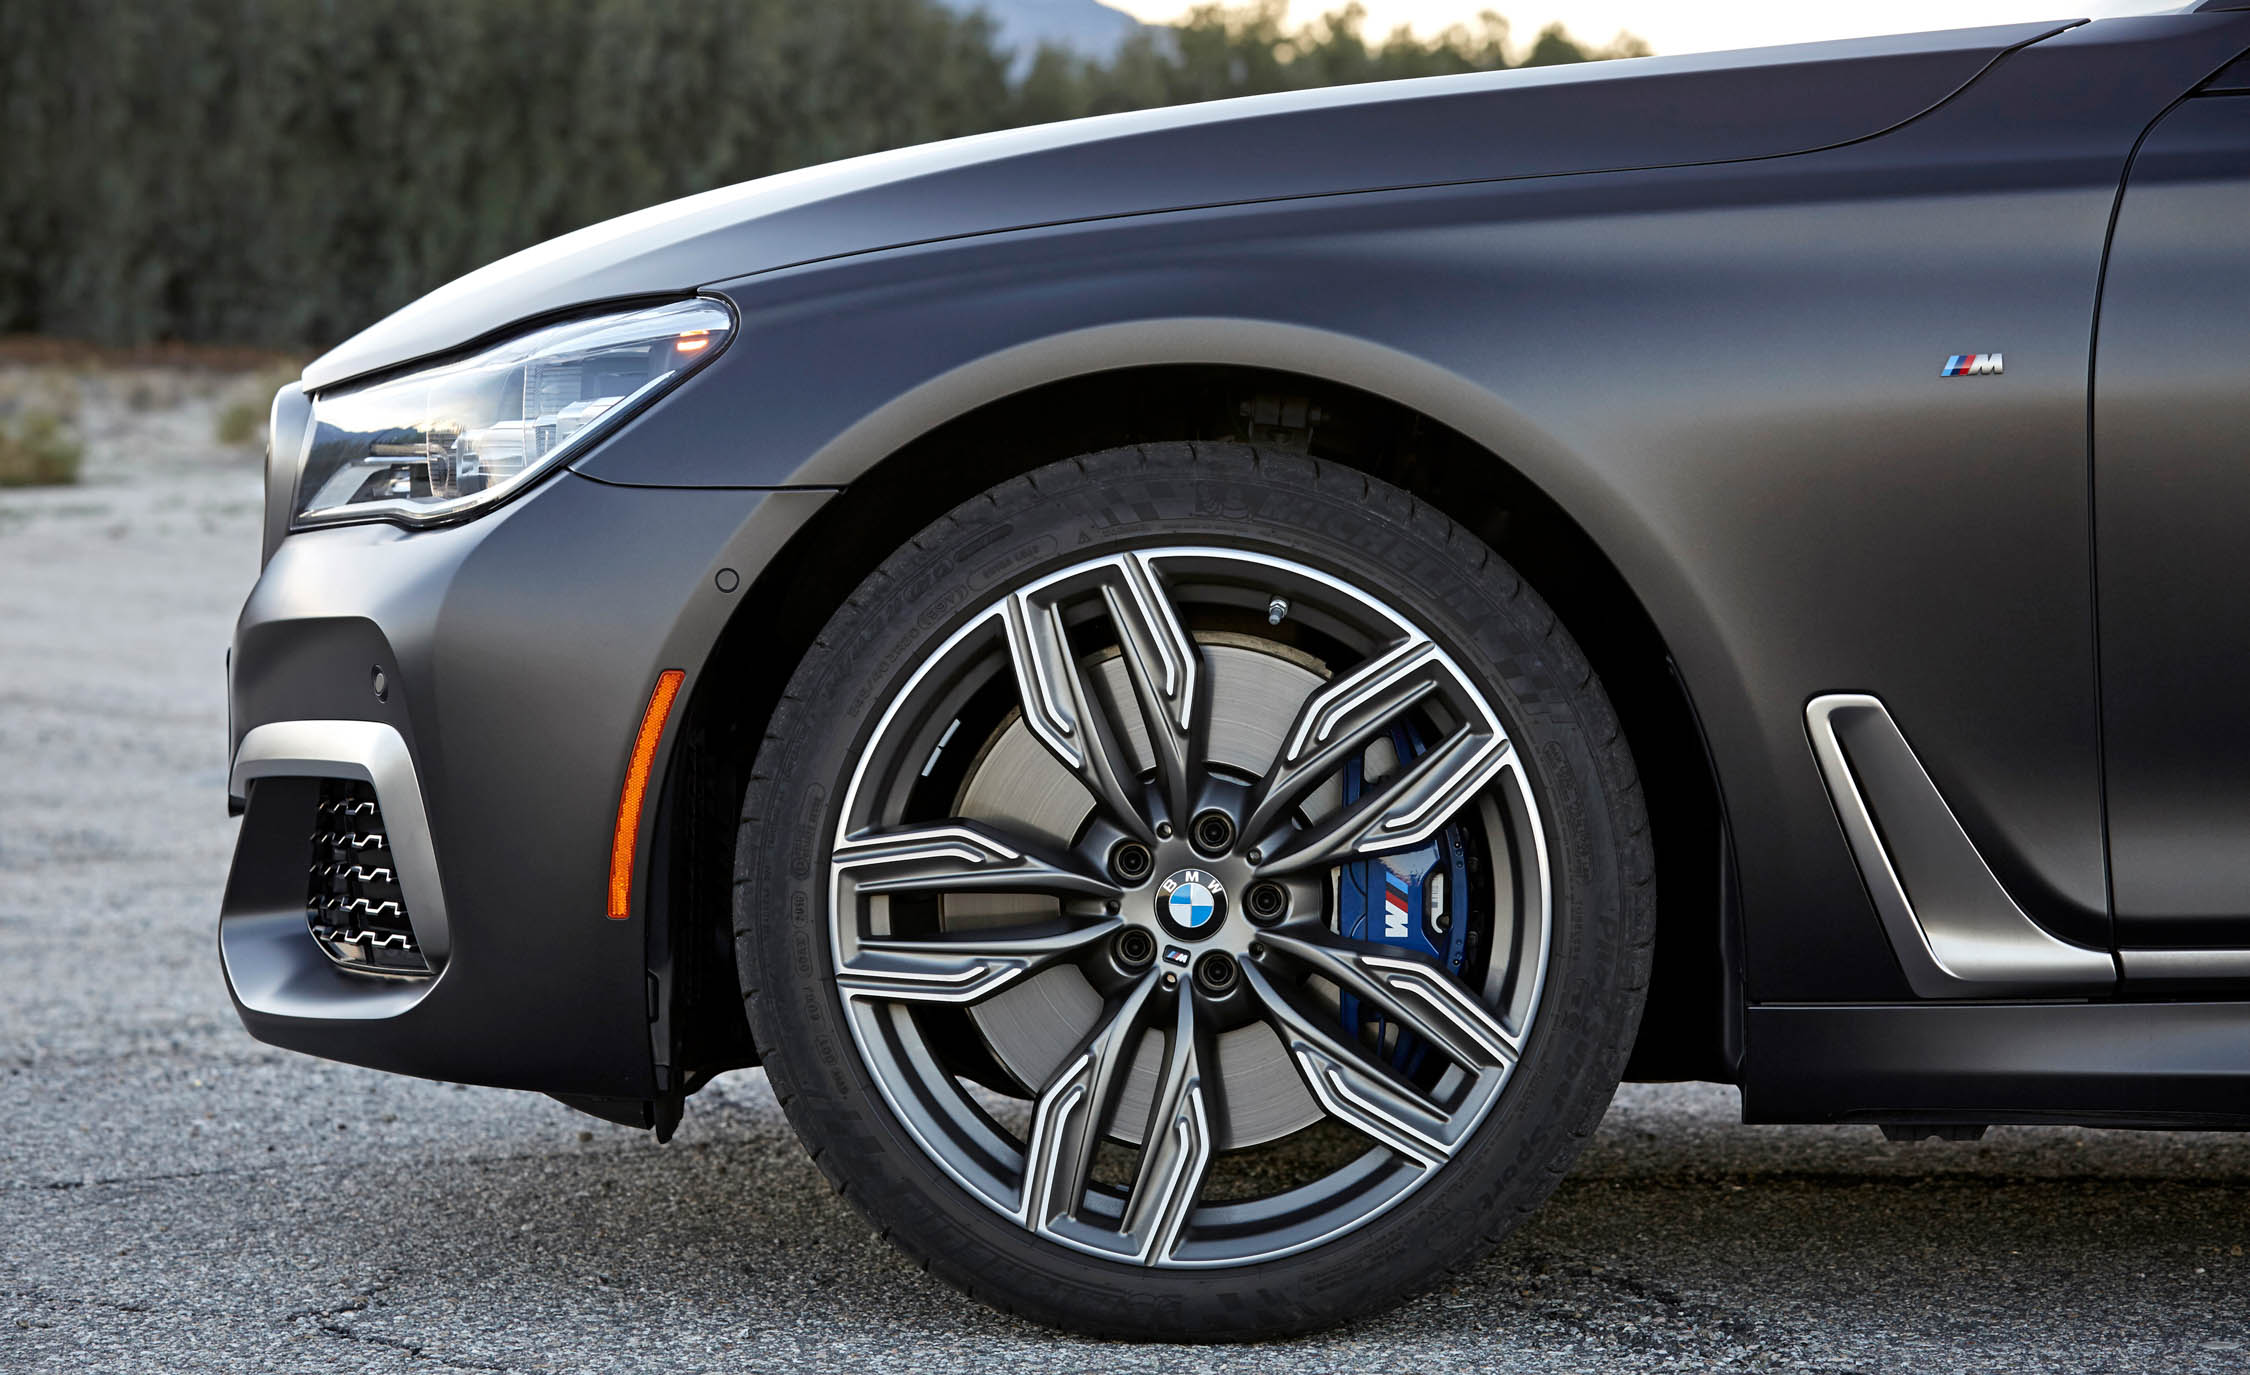 2017 BMW M760i XDrive Exterior View Wheel Trim (View 44 of 76)